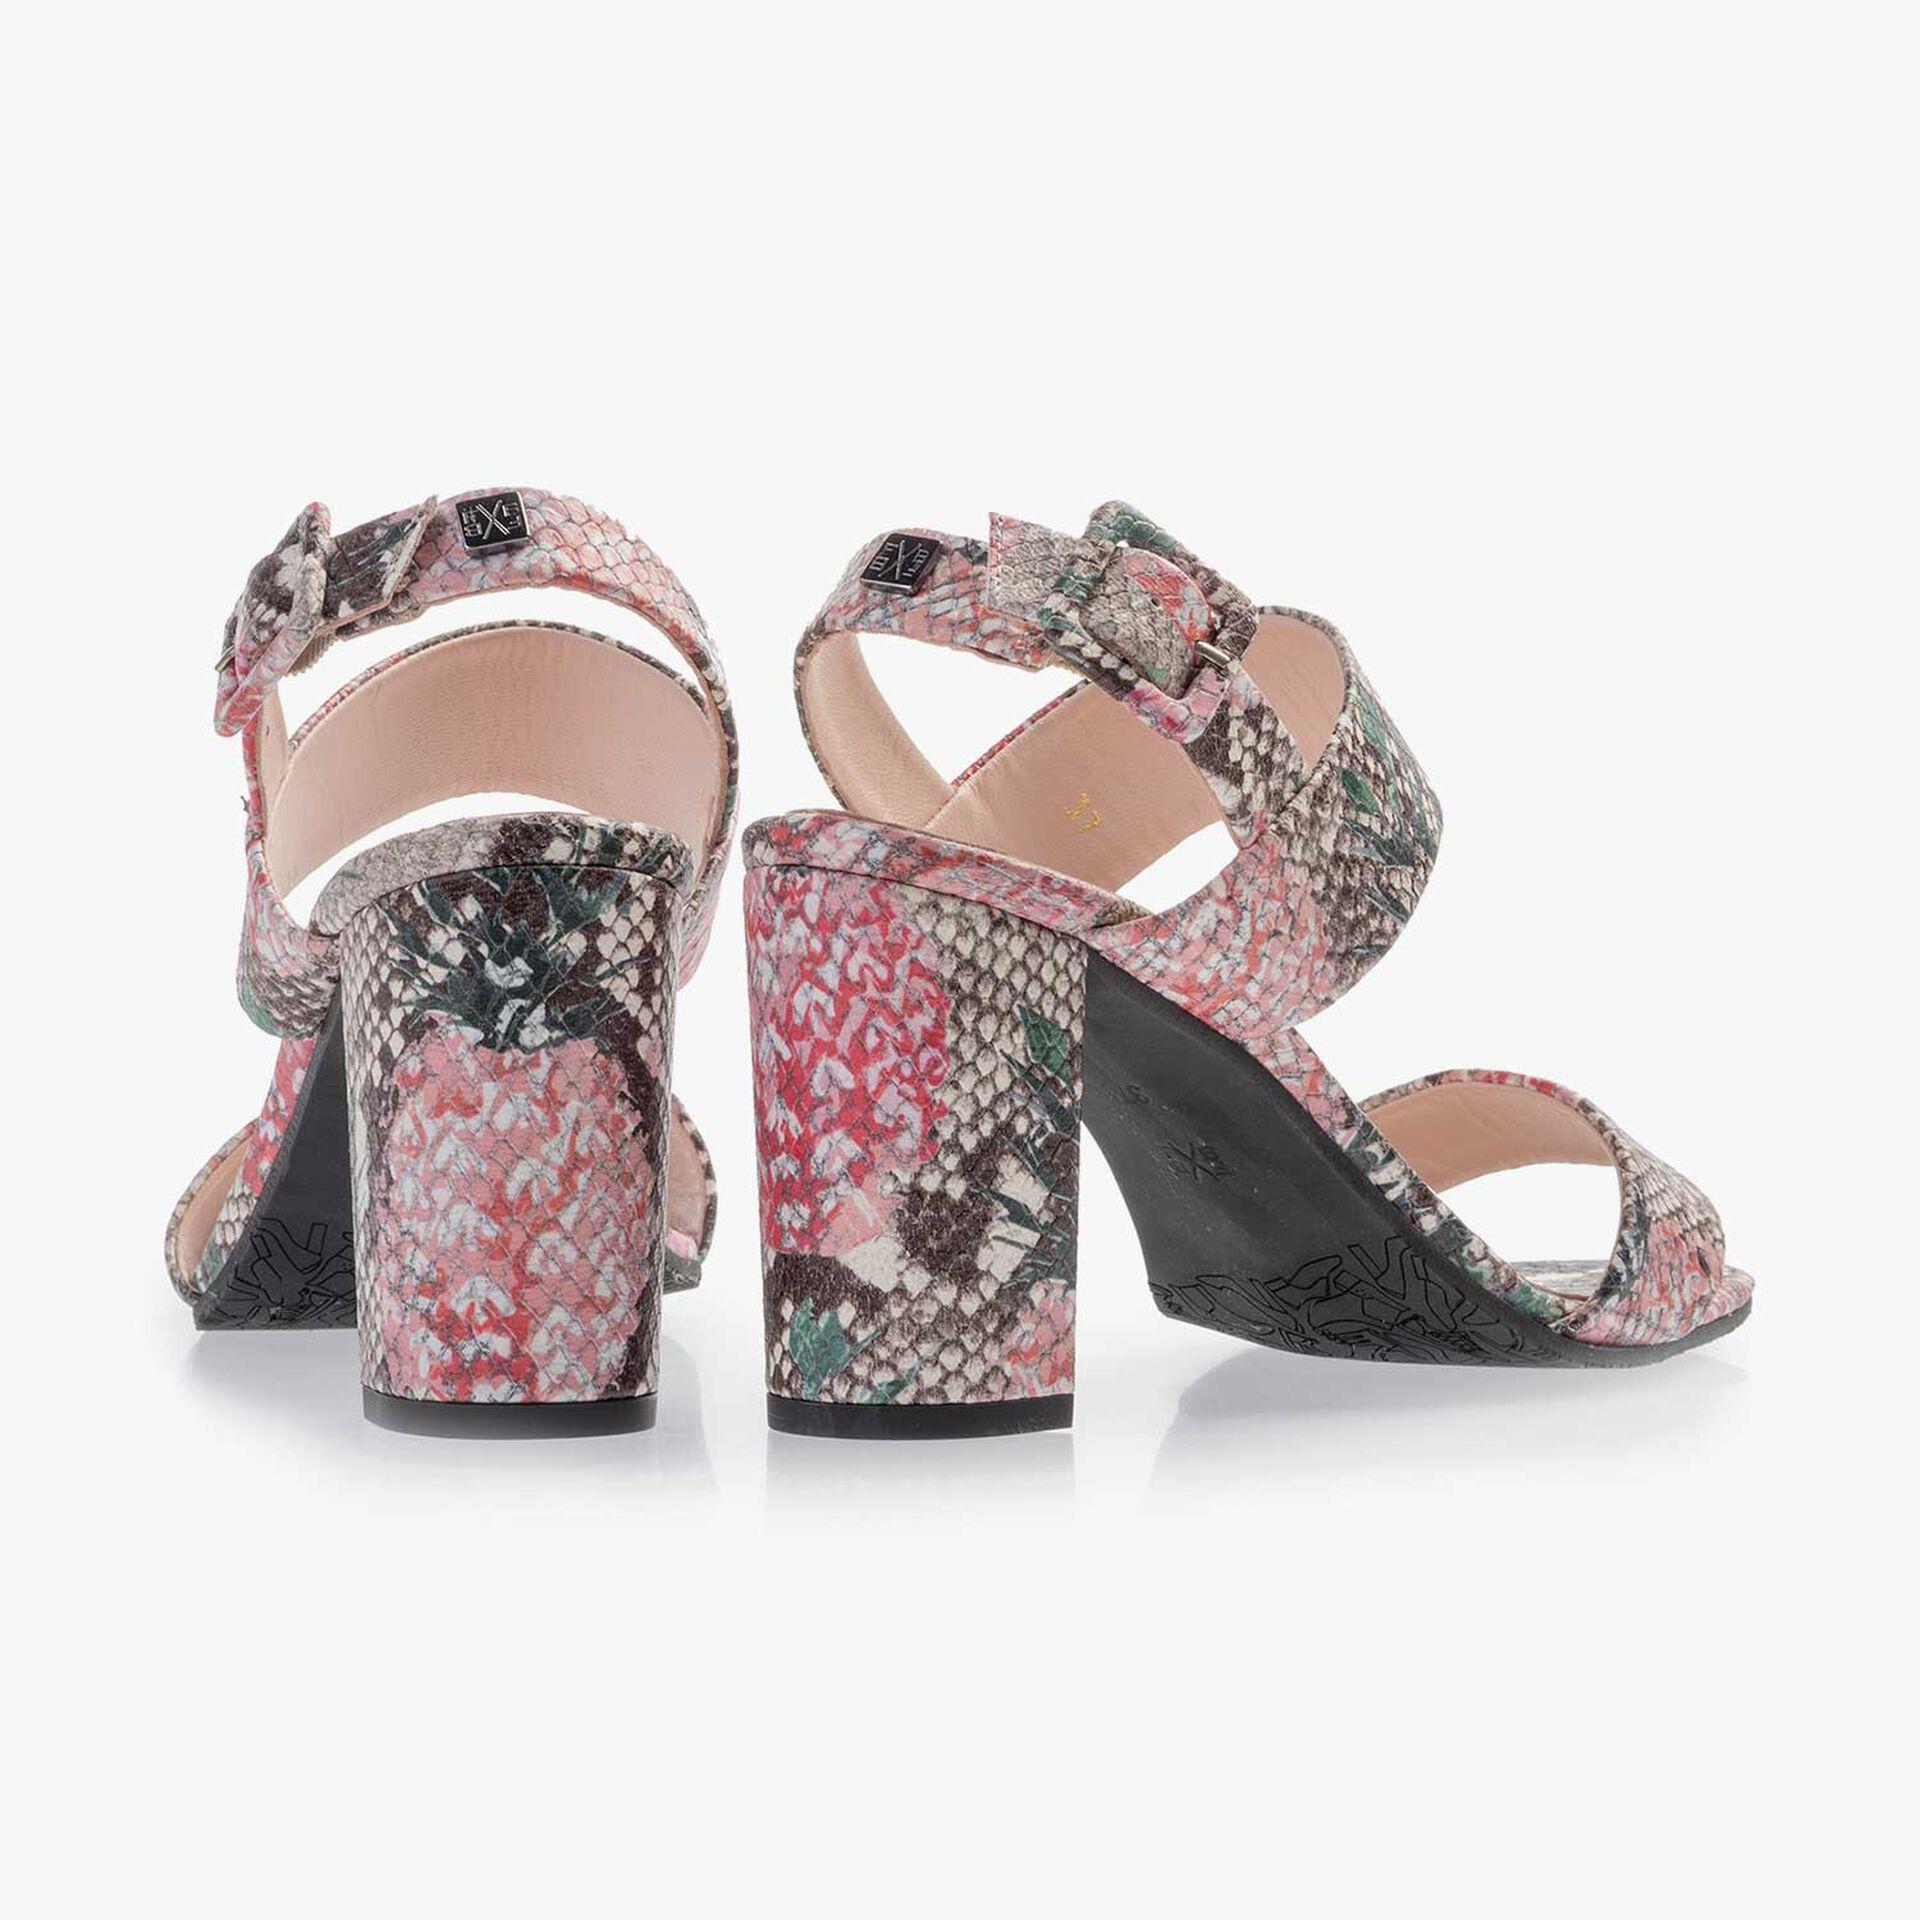 Mehrfarbige bedruckte Leder Sandale